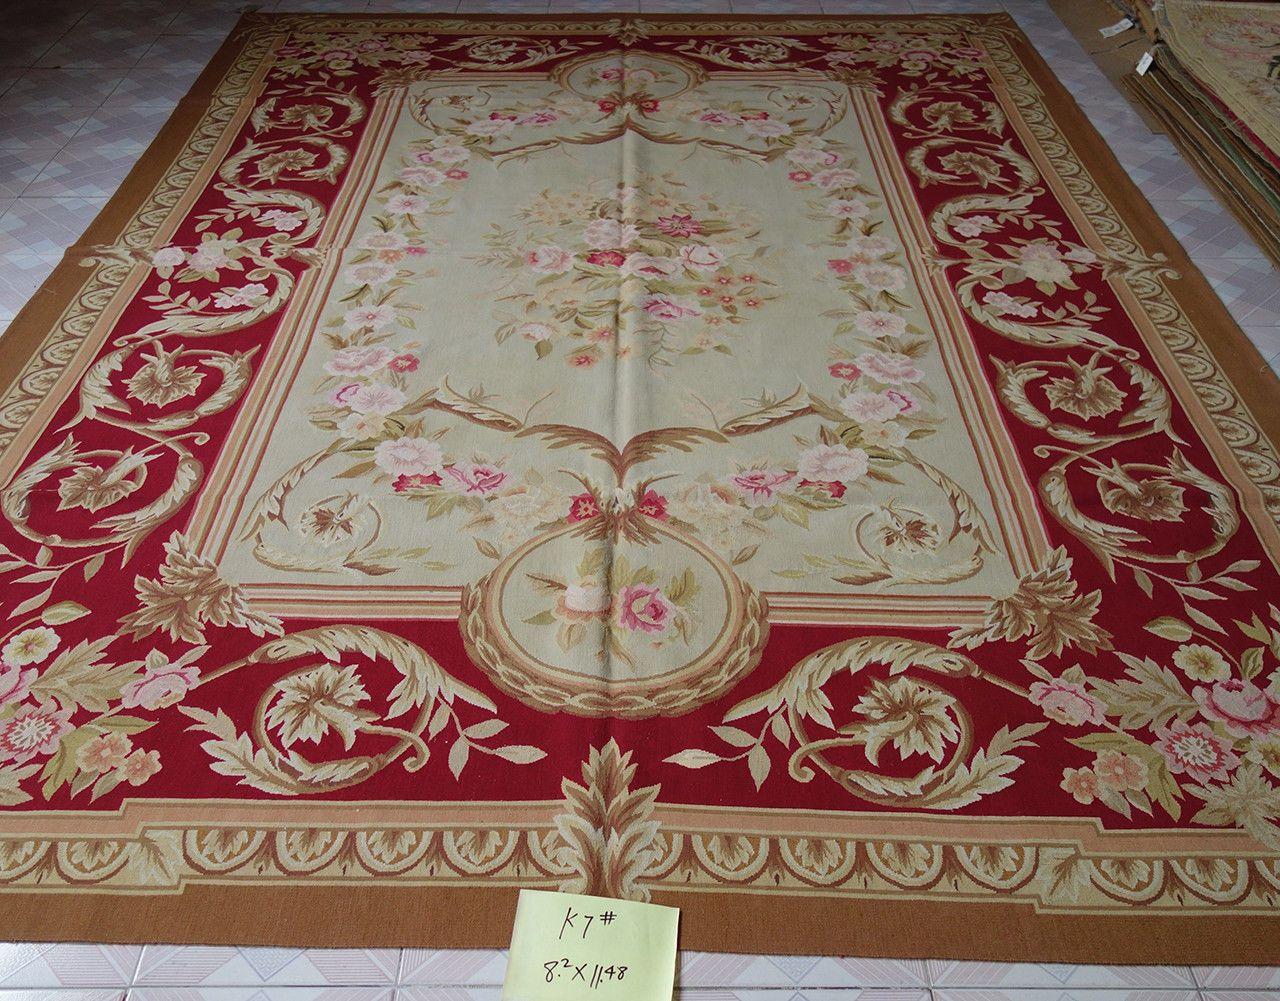 2 5 X 3 Meter Large Burgandy Beige Living Fine Room Decor Aubusson Rug Ebay